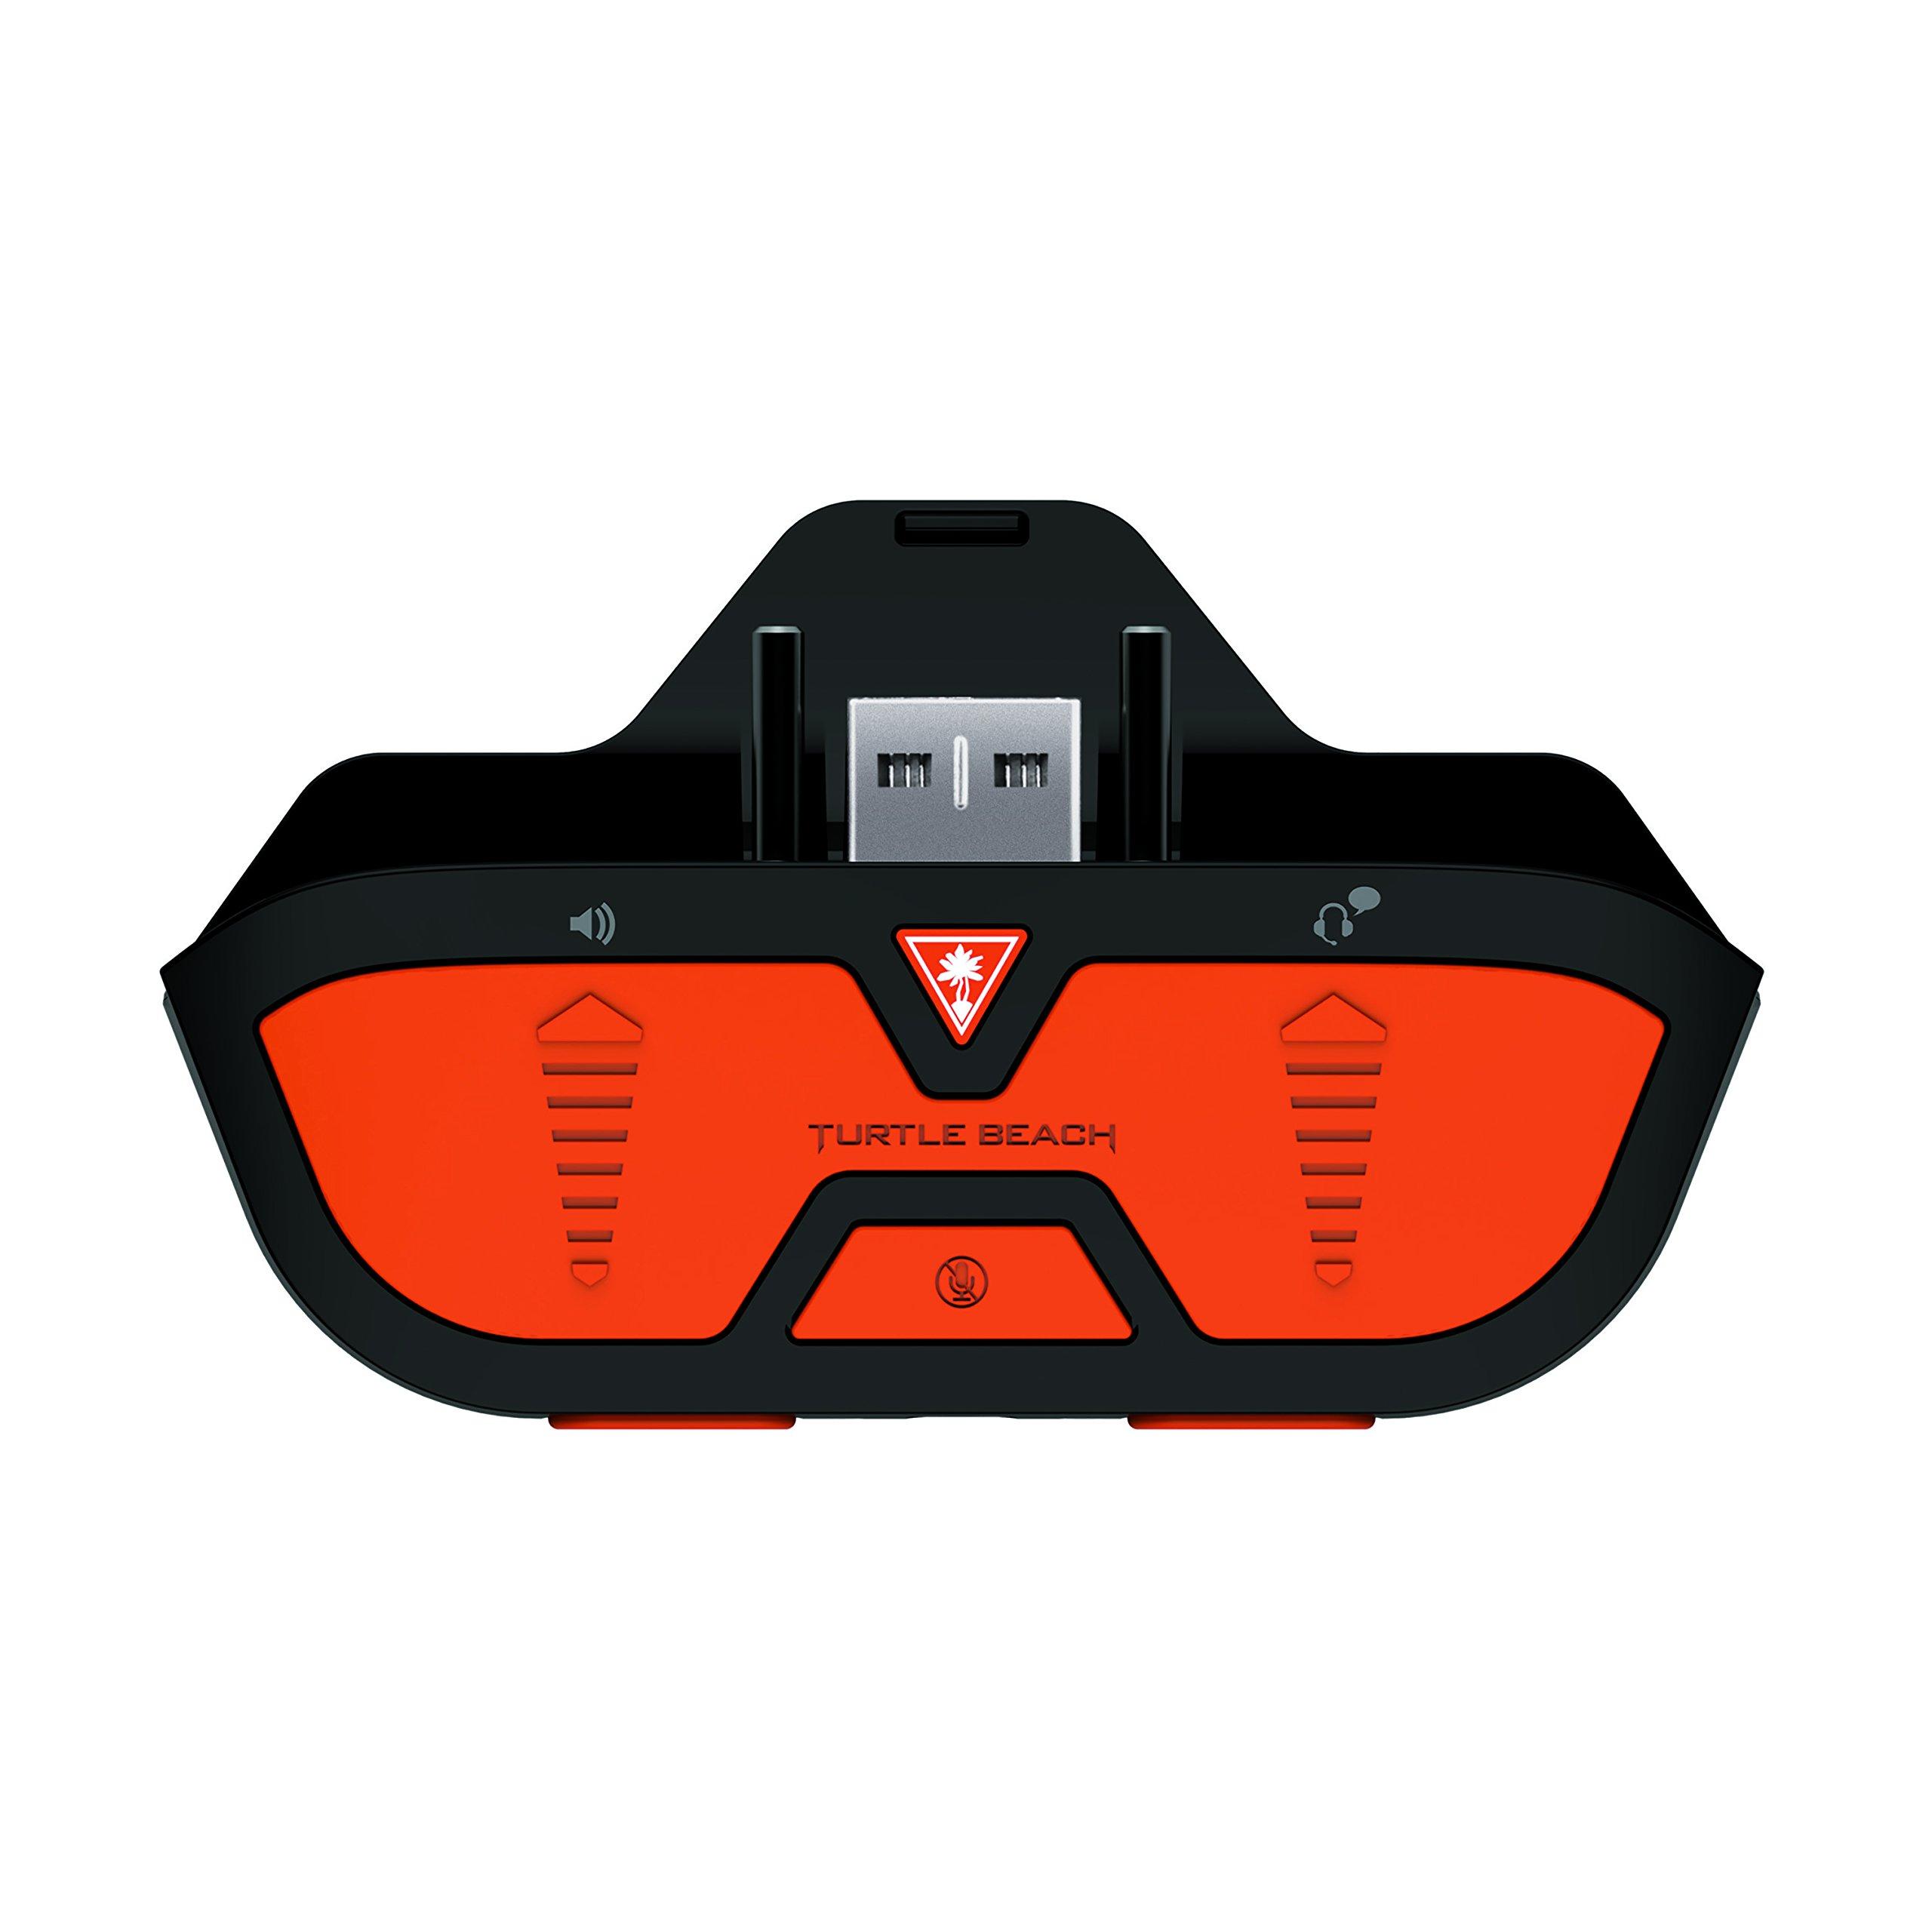 Turtle Beach - Elite Pro Tactical Audio Adapter - Xbox One